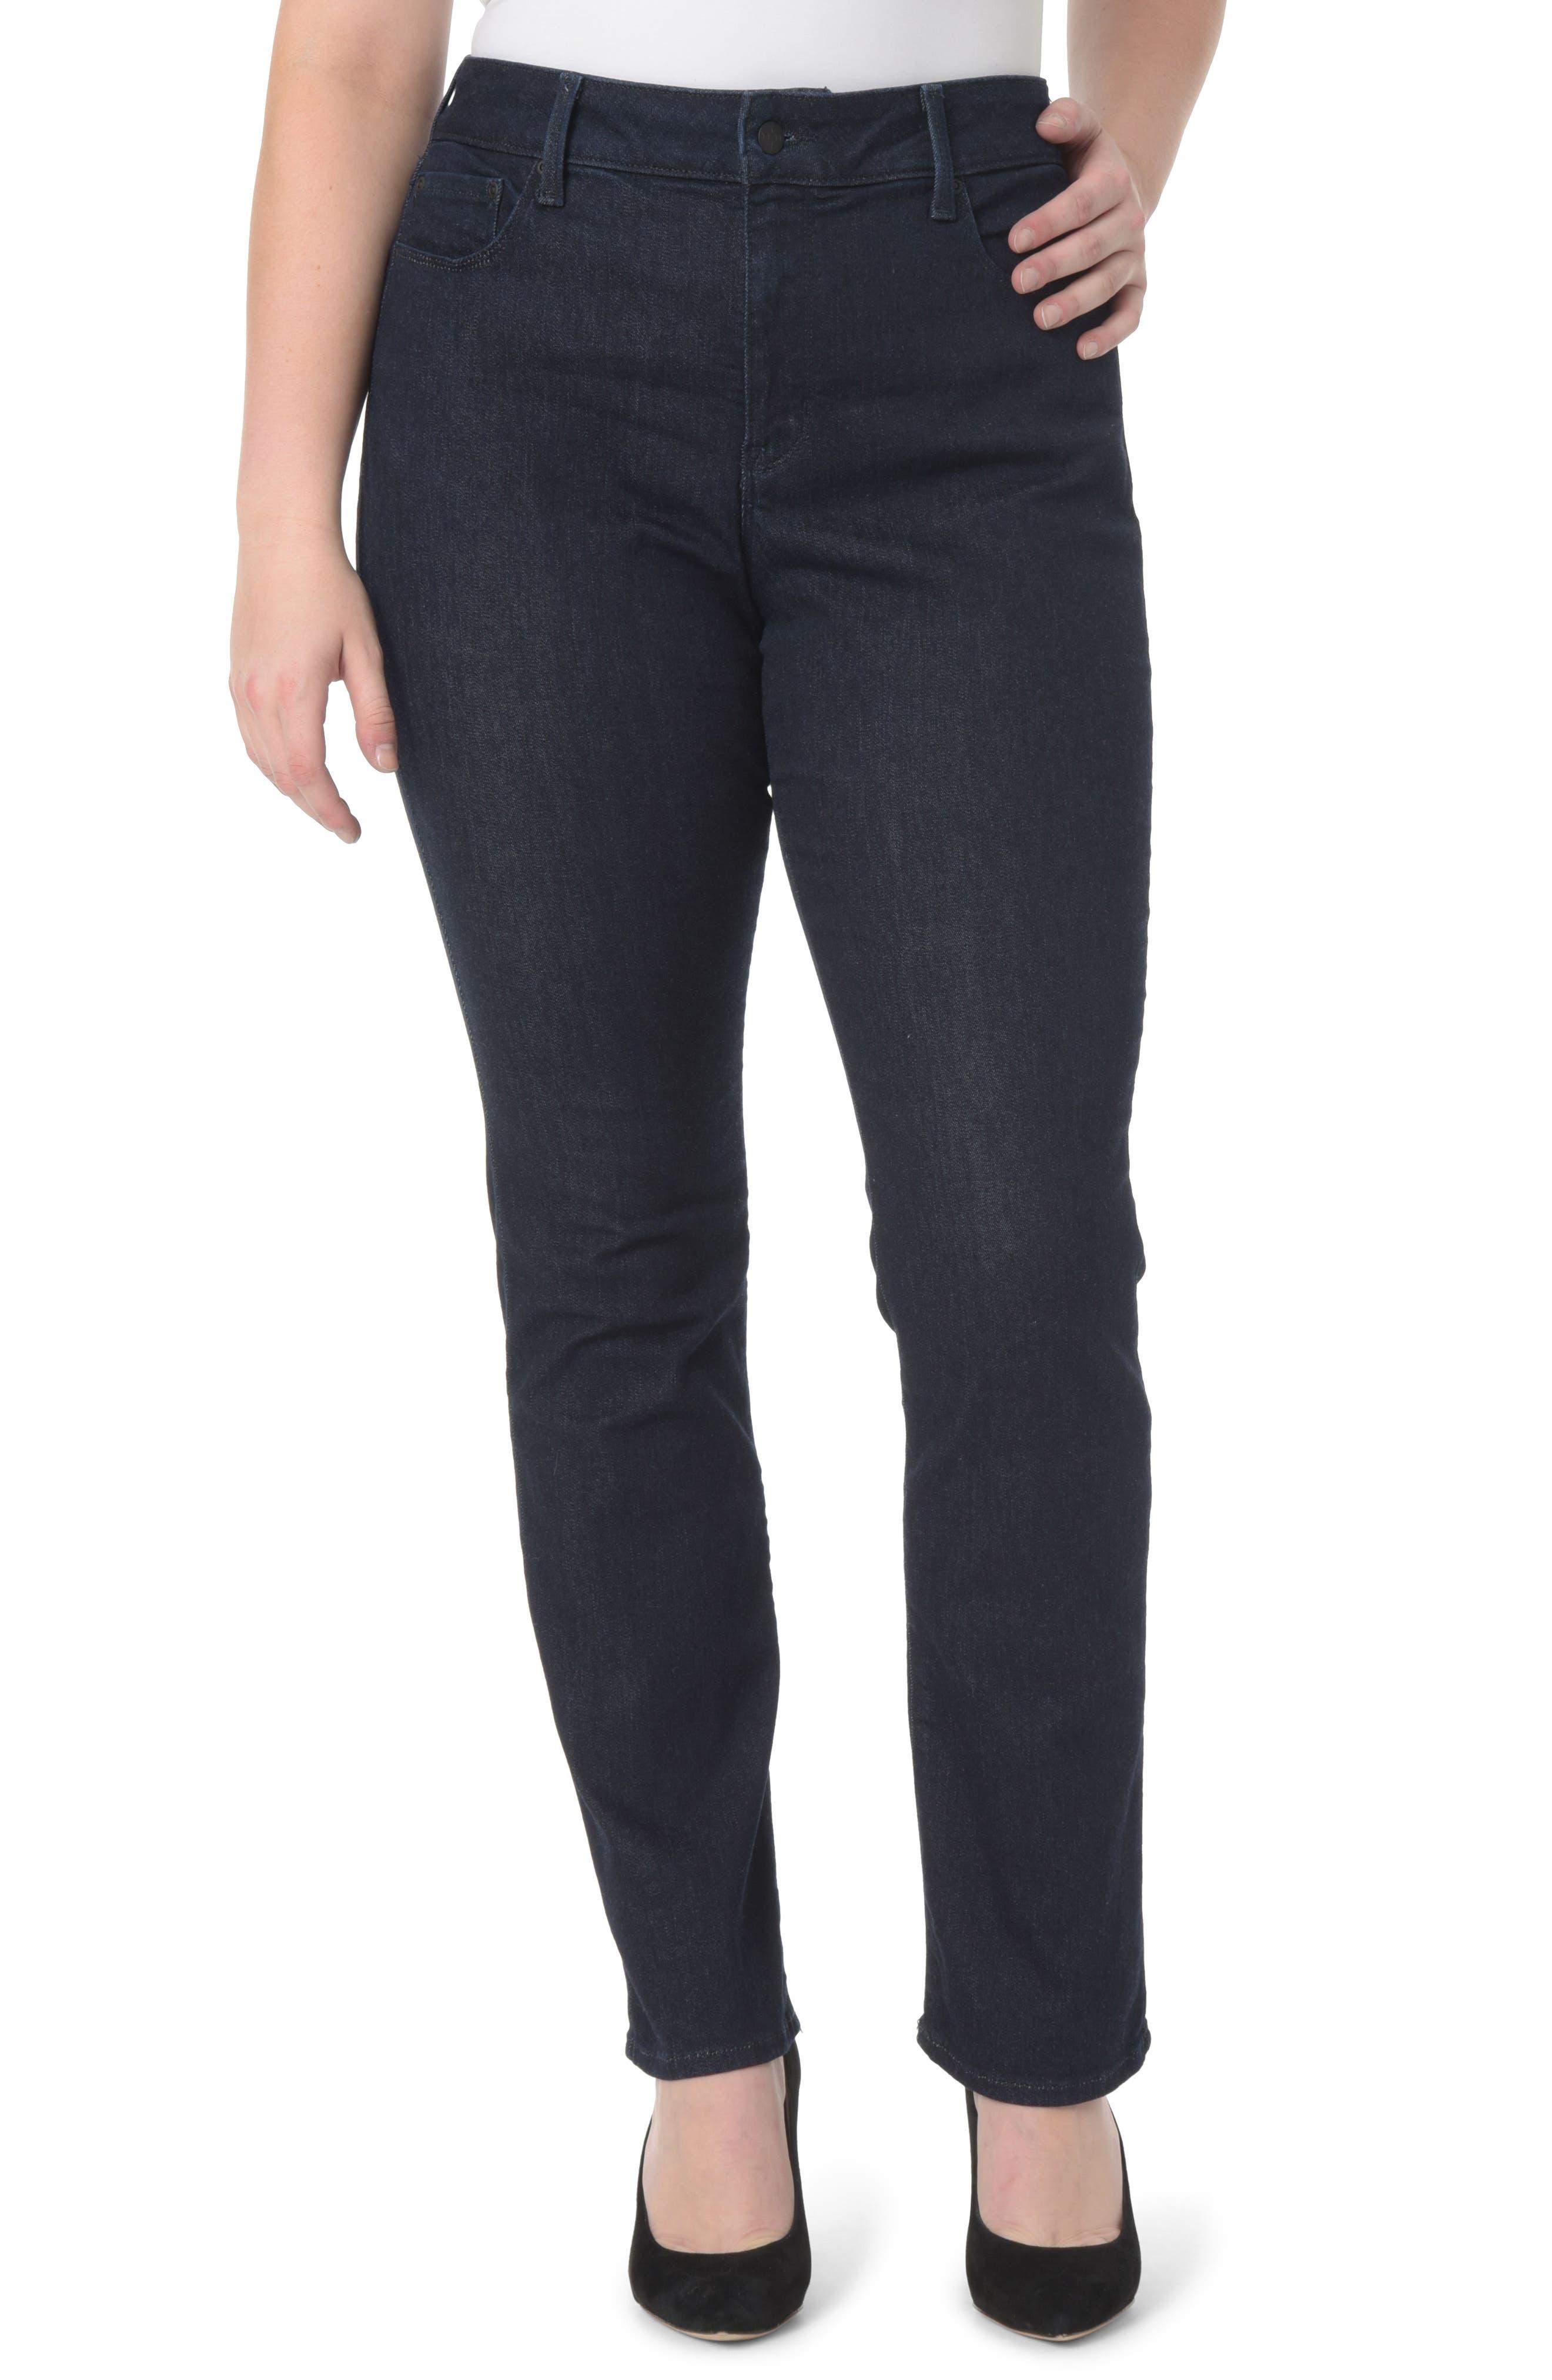 Alternate Image 1 Selected - NYDJ Marilyn Straight Leg Jeans (Plus Size)